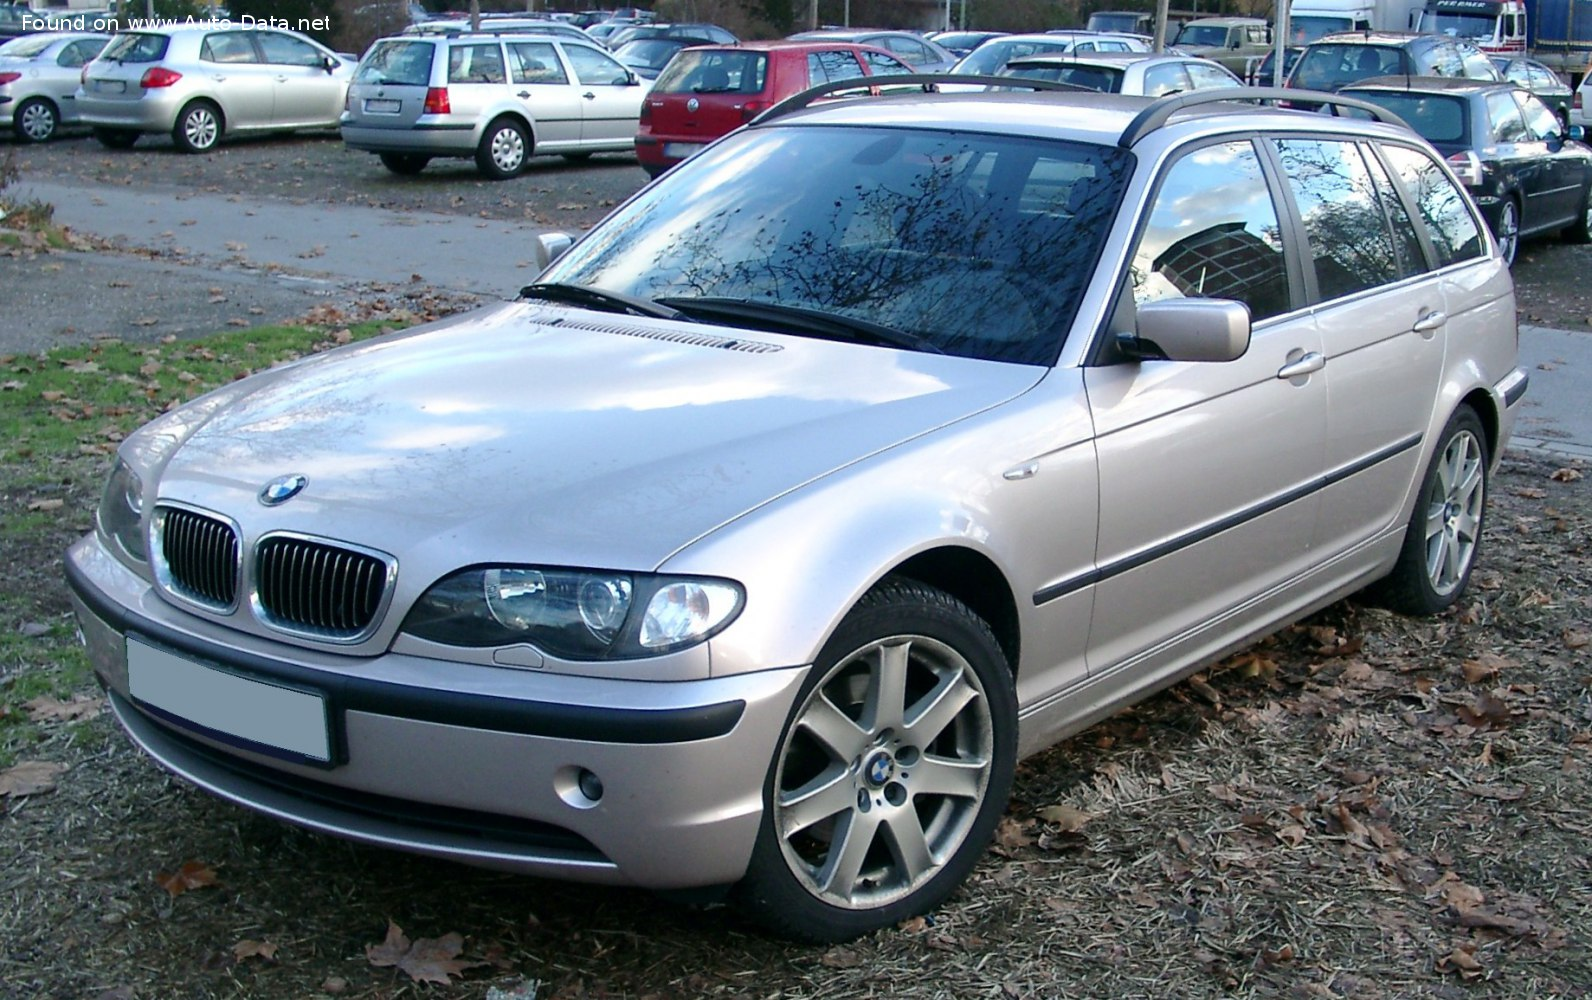 2001 Bmw 3 Series Touring E46 Facelift 2001 320d 150 Hp Technical Specs Data Fuel Consumption Dimensions